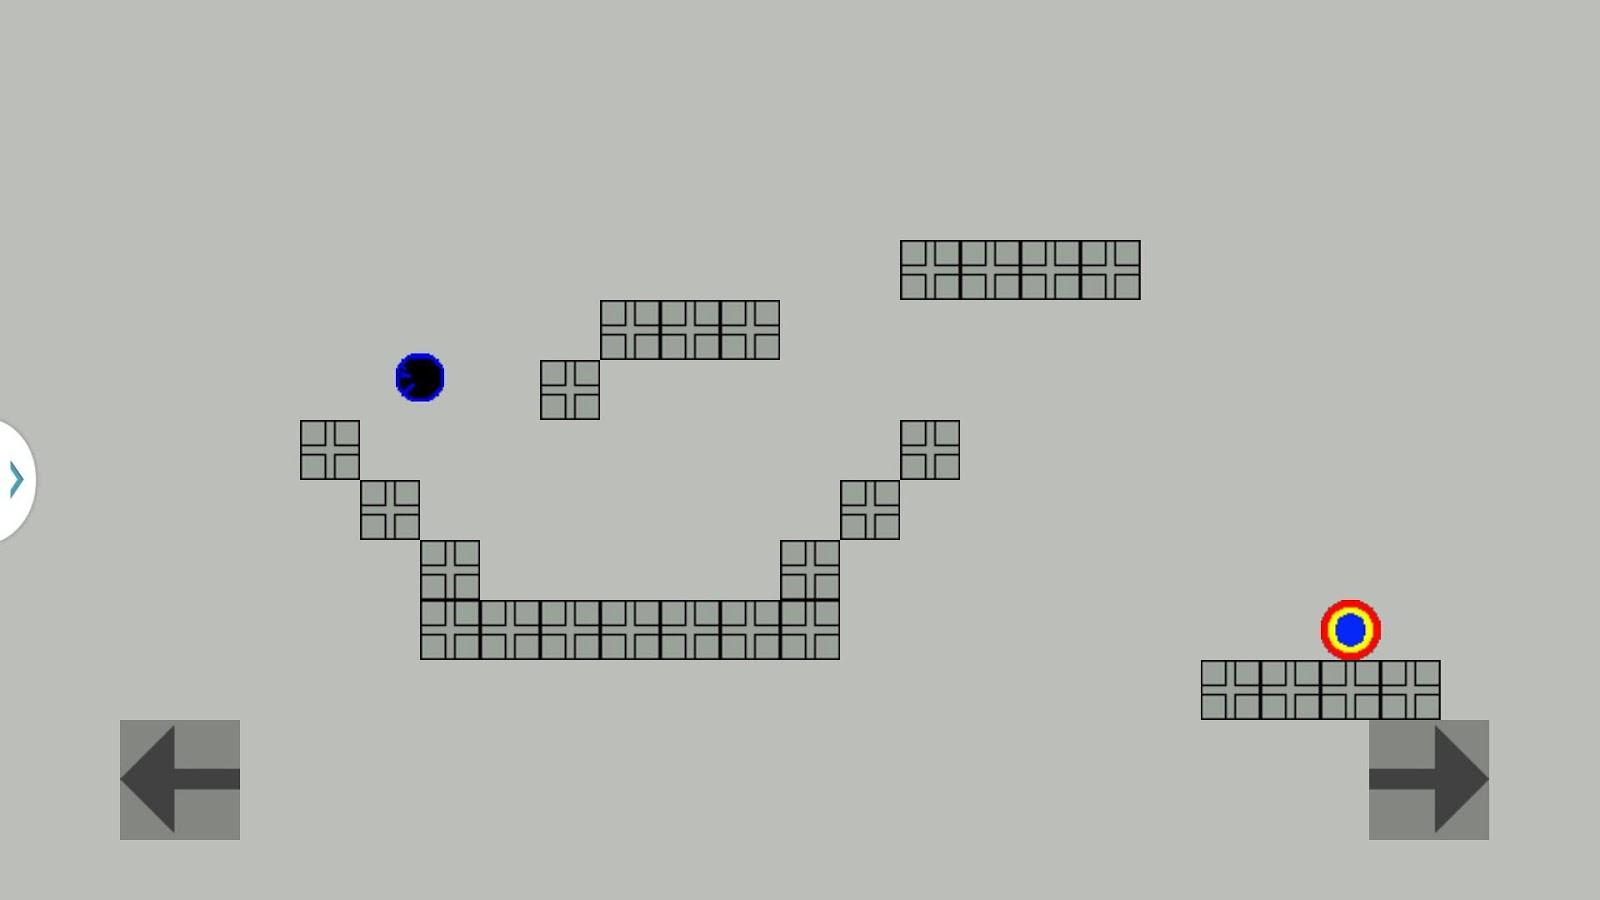 The-Generic-Platformer-Game 6